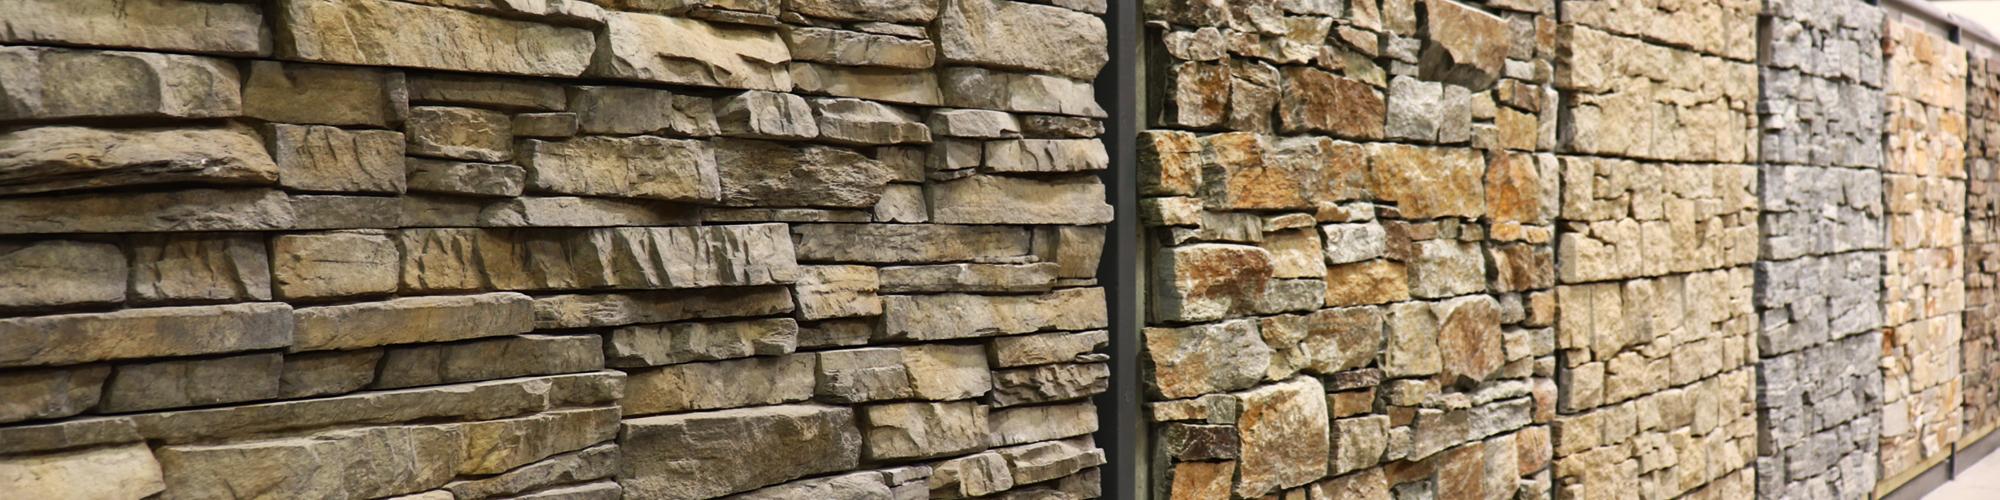 Stone cladding, interior cladding, exterior cladding, cladding, wall cladding, stone veneer,